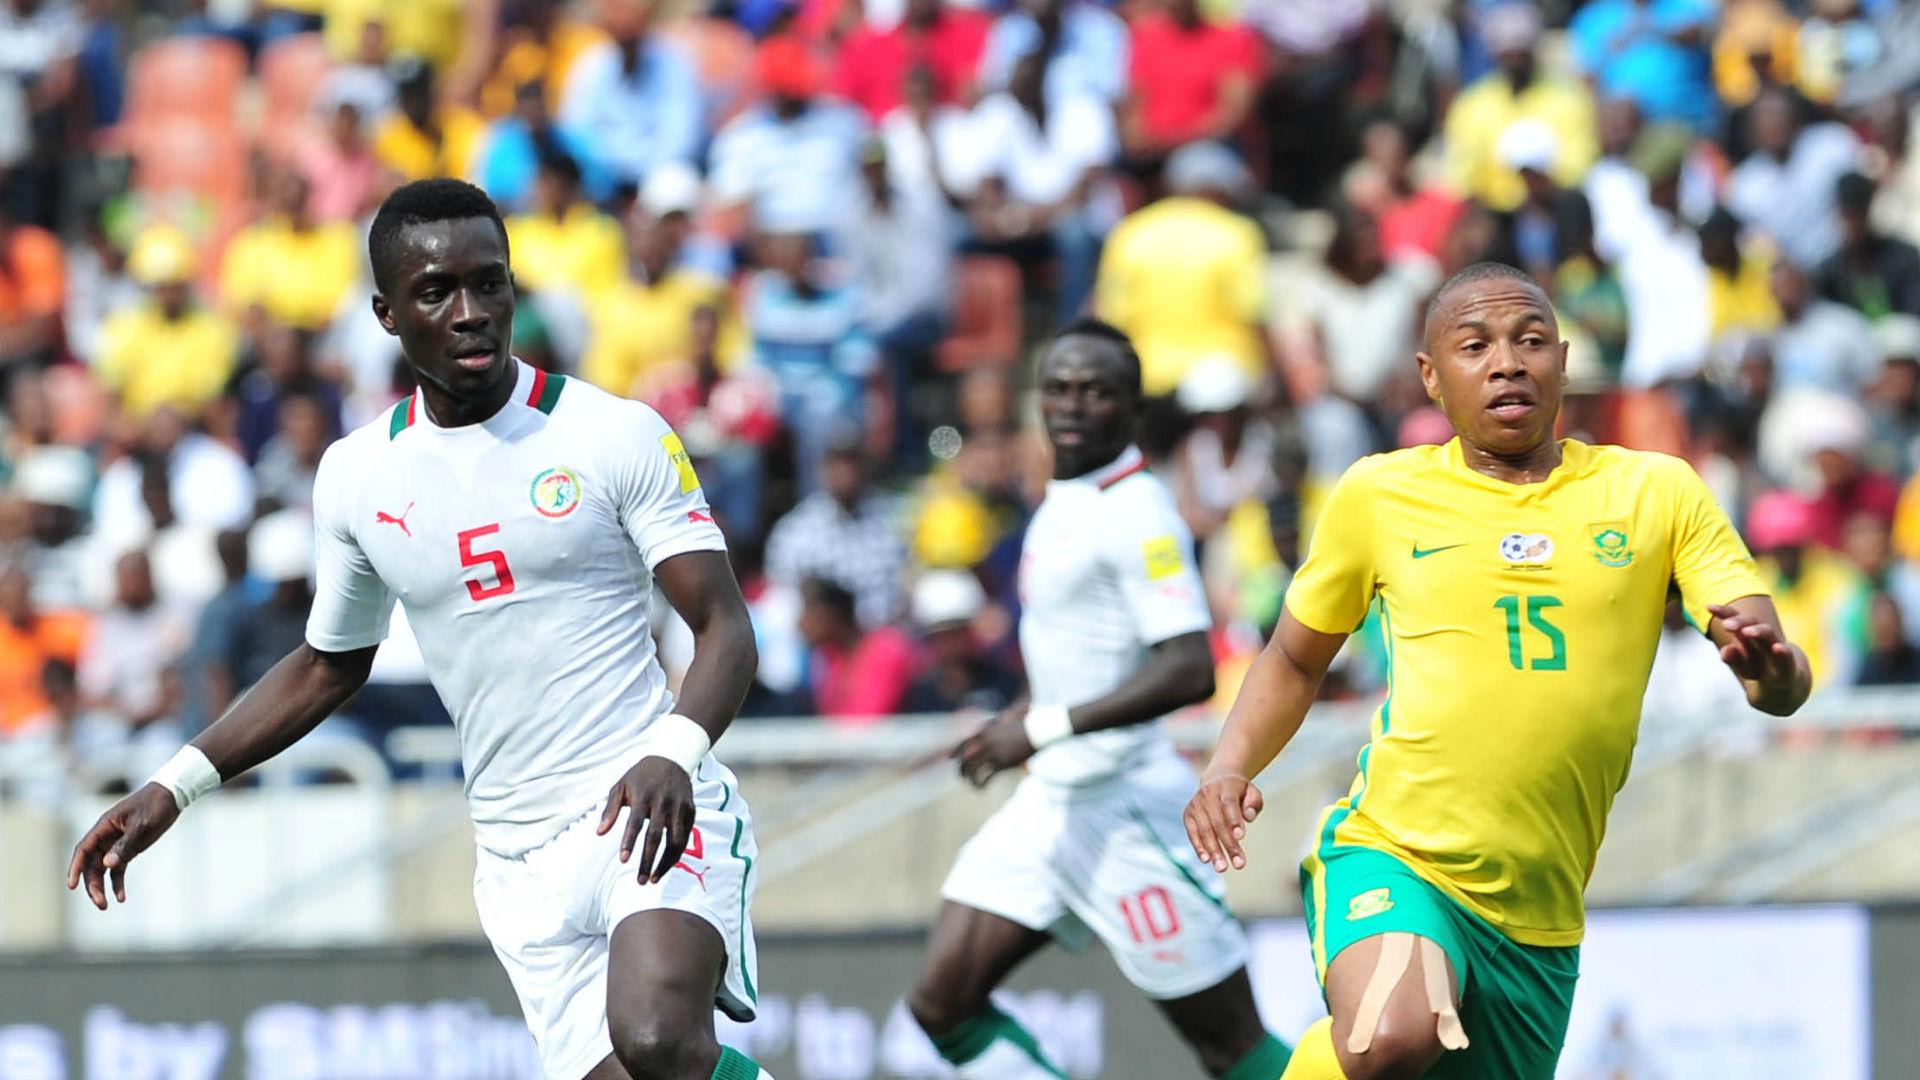 Idrissa Gana Gueye & Andile Jali